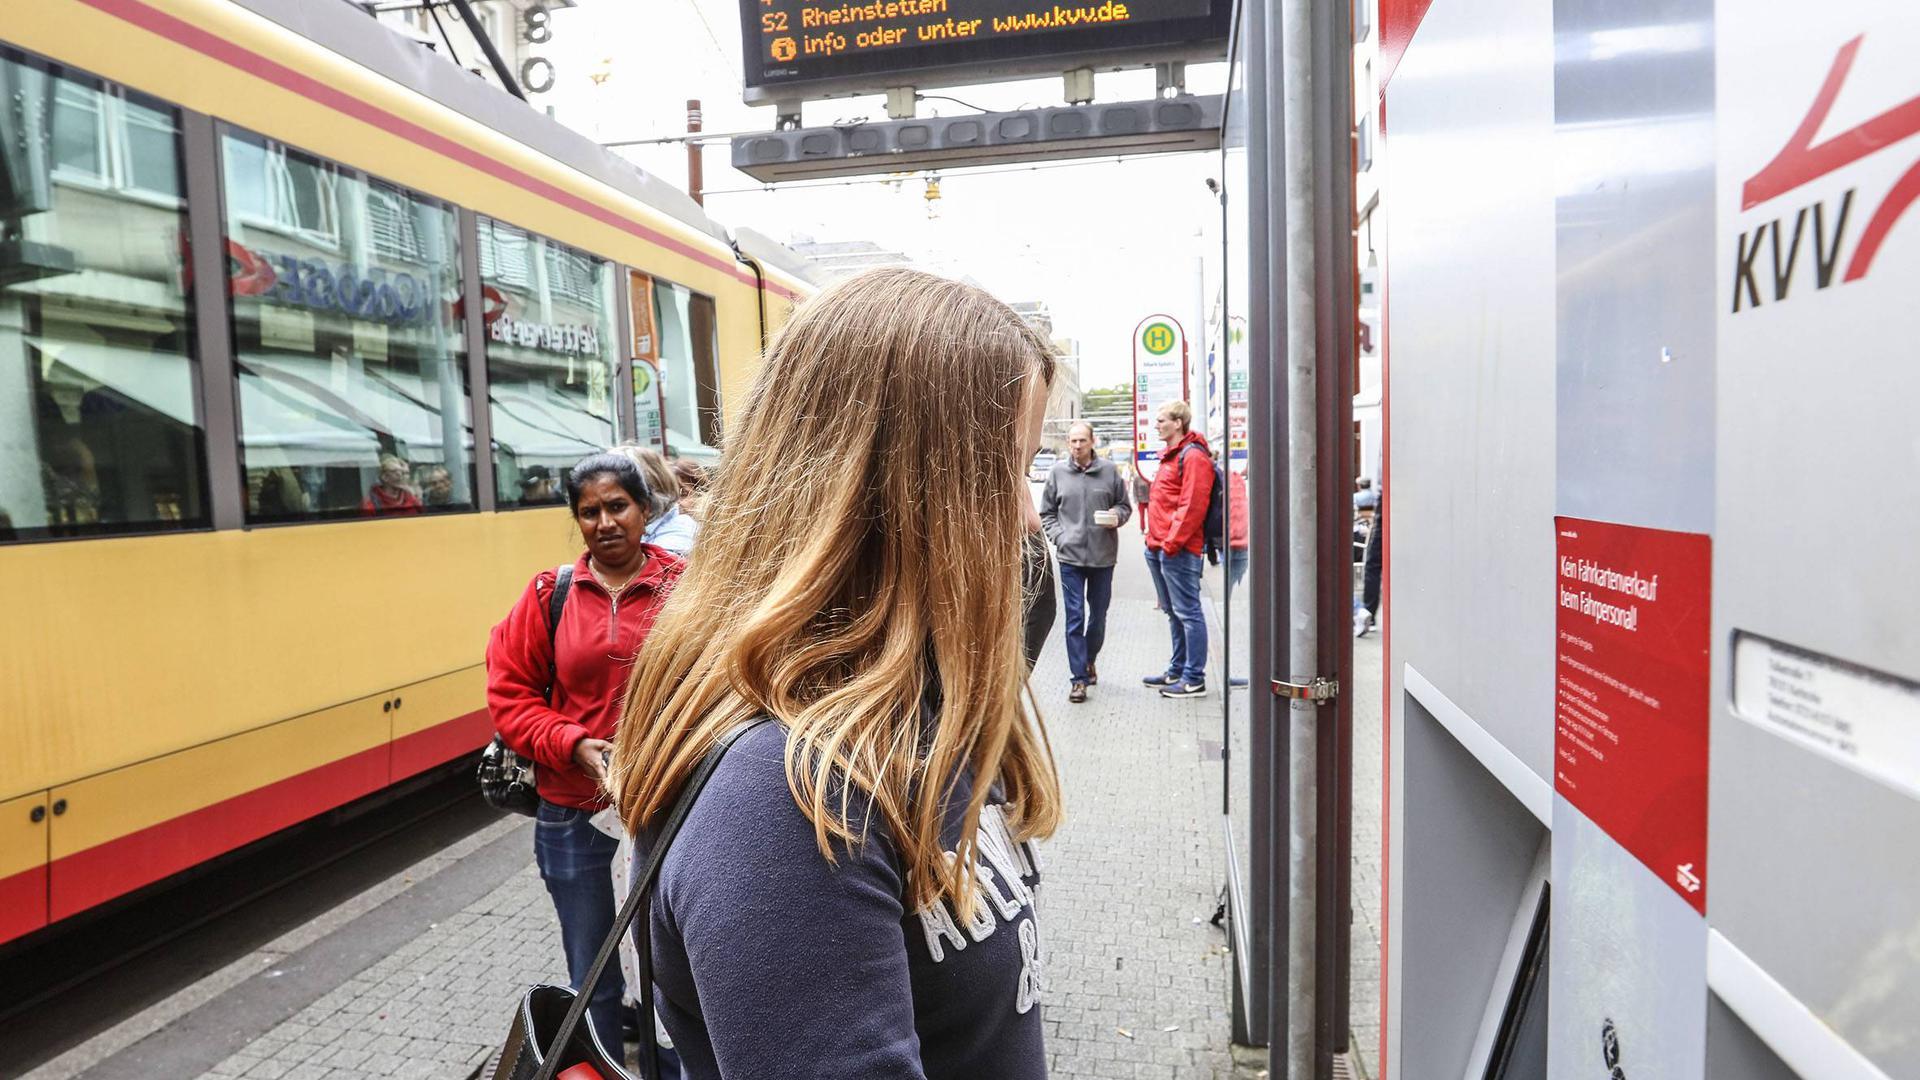 KVV Stadtbahn Karlsruher-Verkehrs-Verbund Straßenbahn Karlsruhe